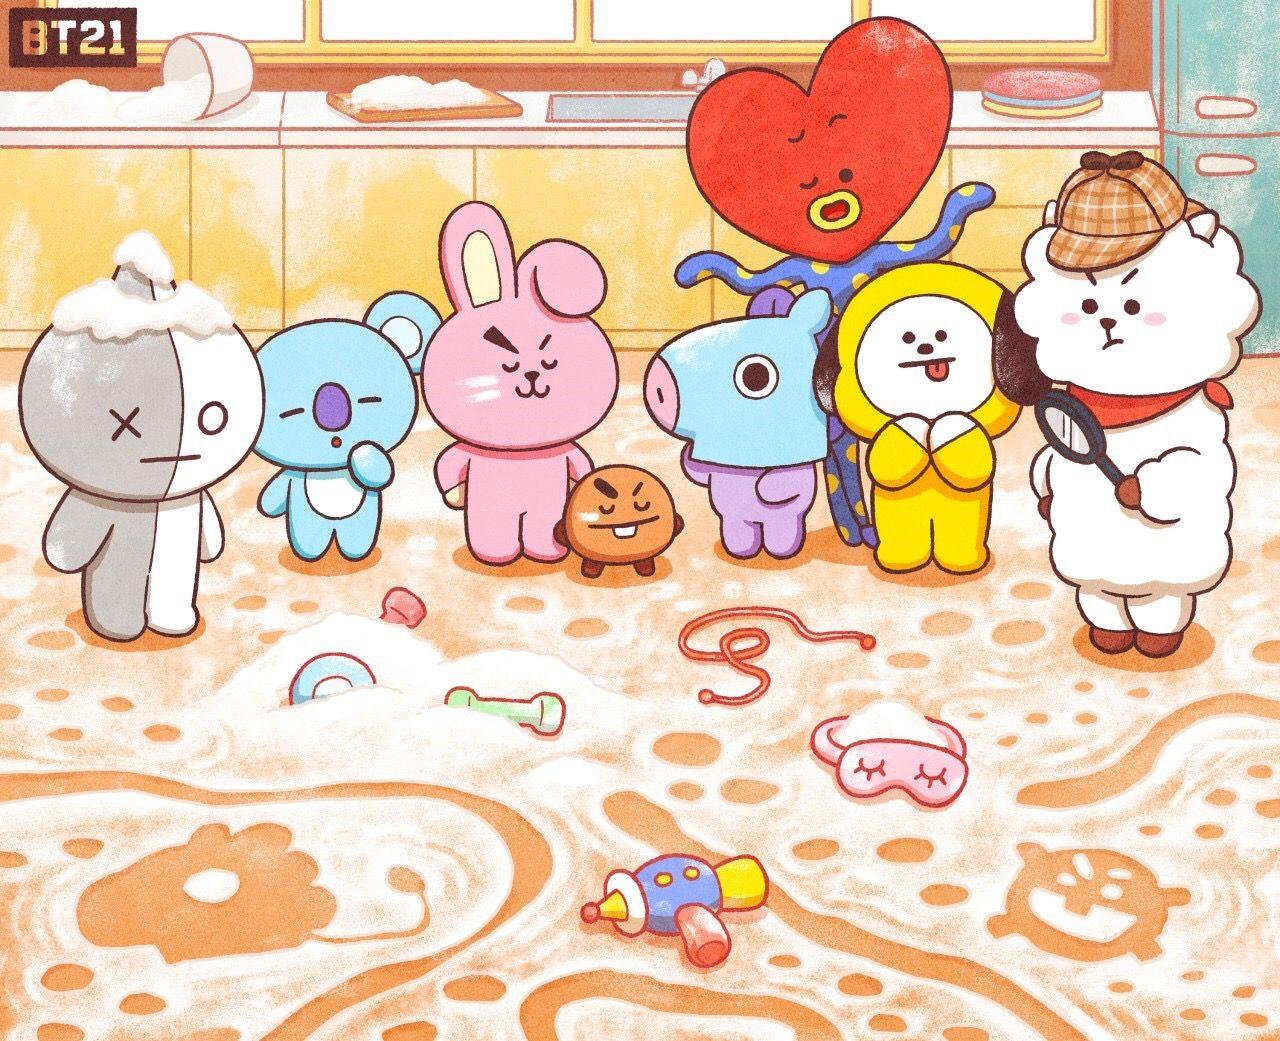 Van Mang /& Shooky T-shirt BT21 Anime Characters RJ Chimmy Koya Cooky Tata